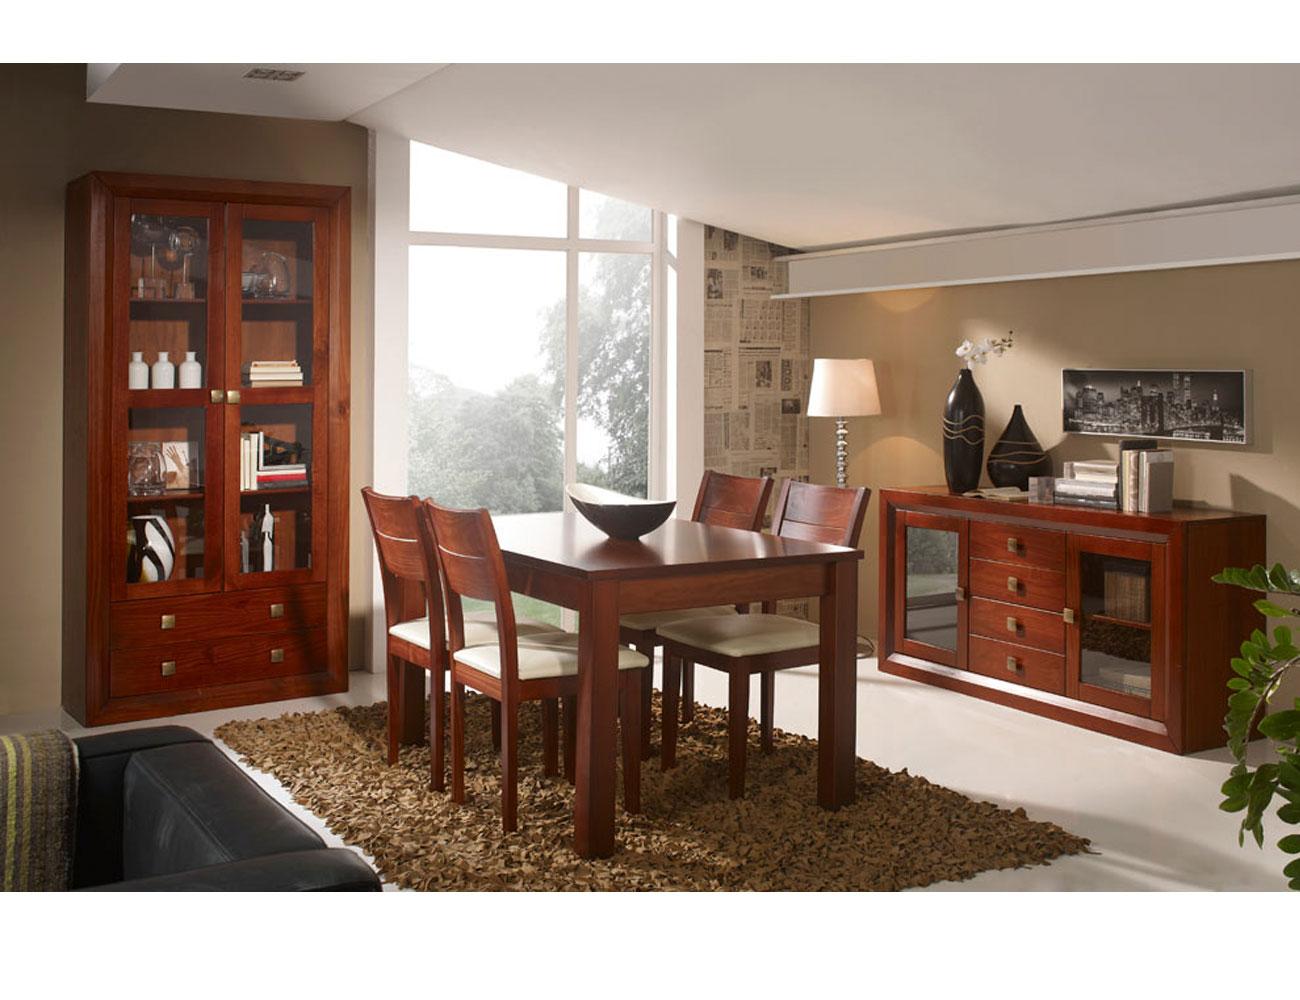 Muebles salon comedor nogal madera dm vitrina aparador mesa extensible sillas2